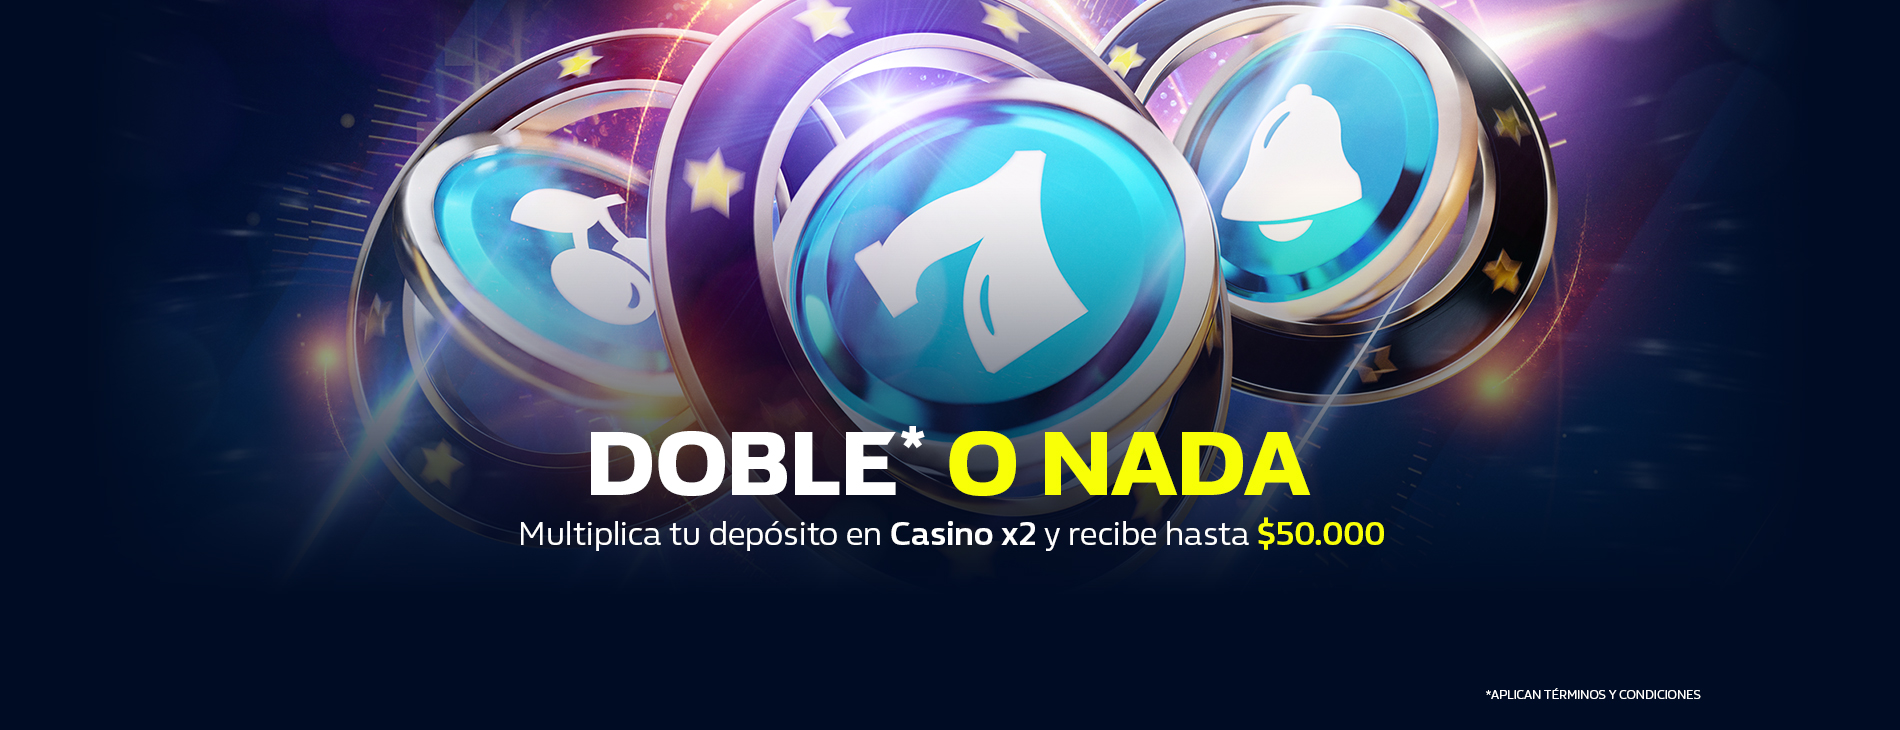 sportbook_bono_doble-o-nada-casino_full